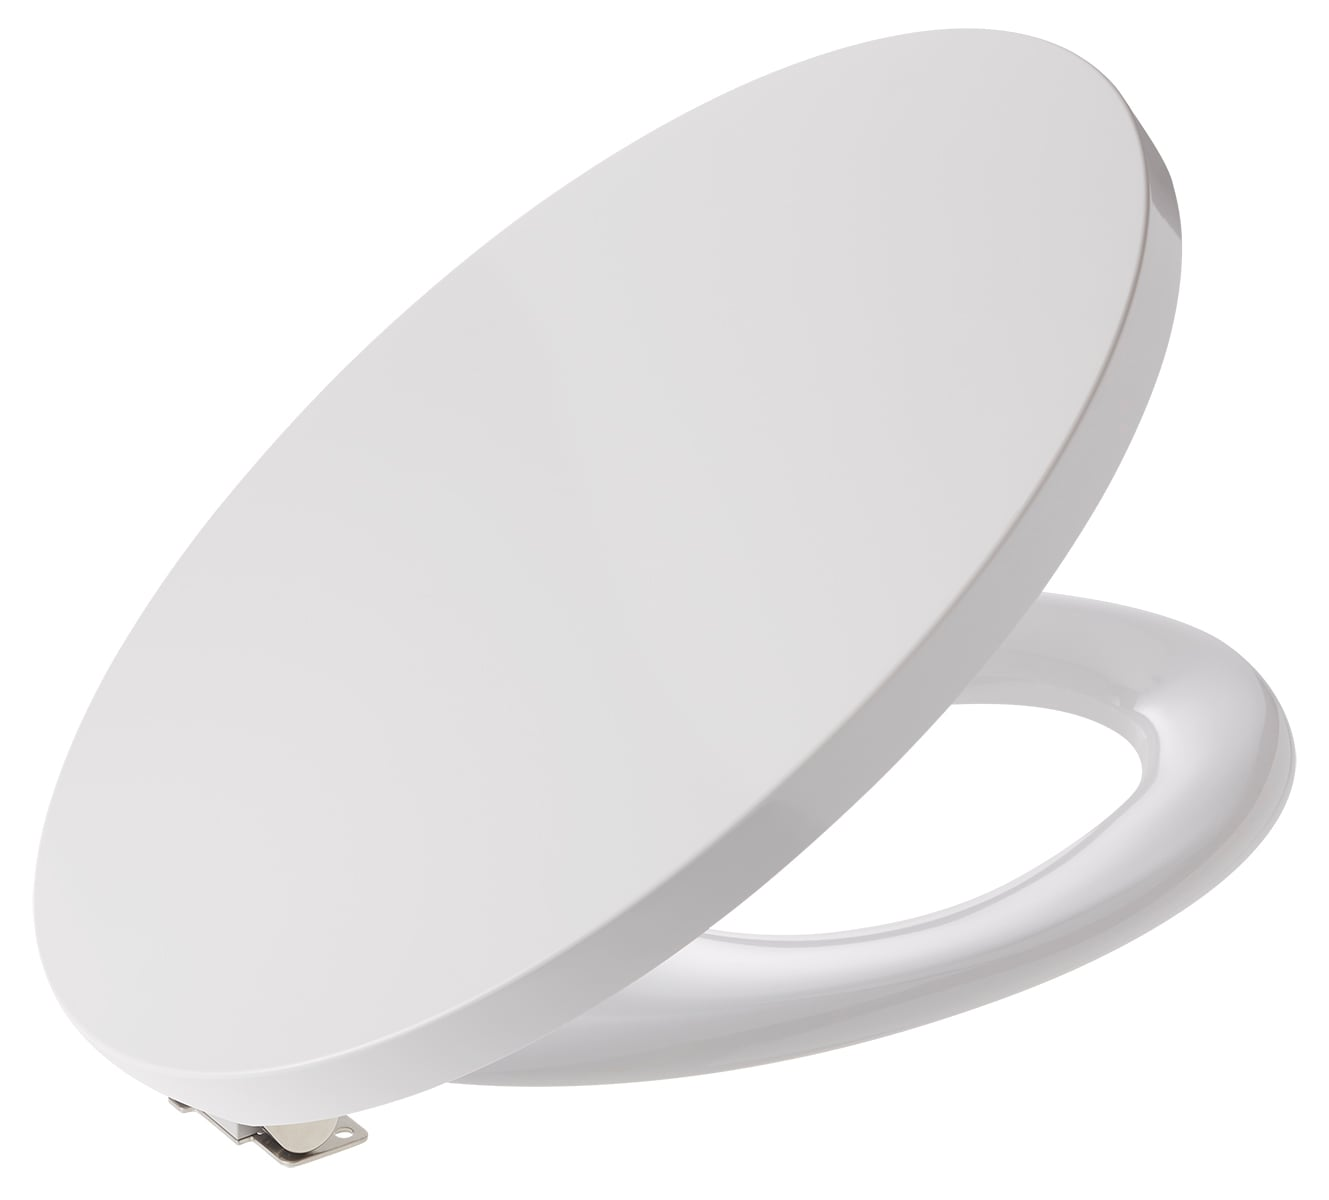 Astonishing Kohler K 1022679 Machost Co Dining Chair Design Ideas Machostcouk